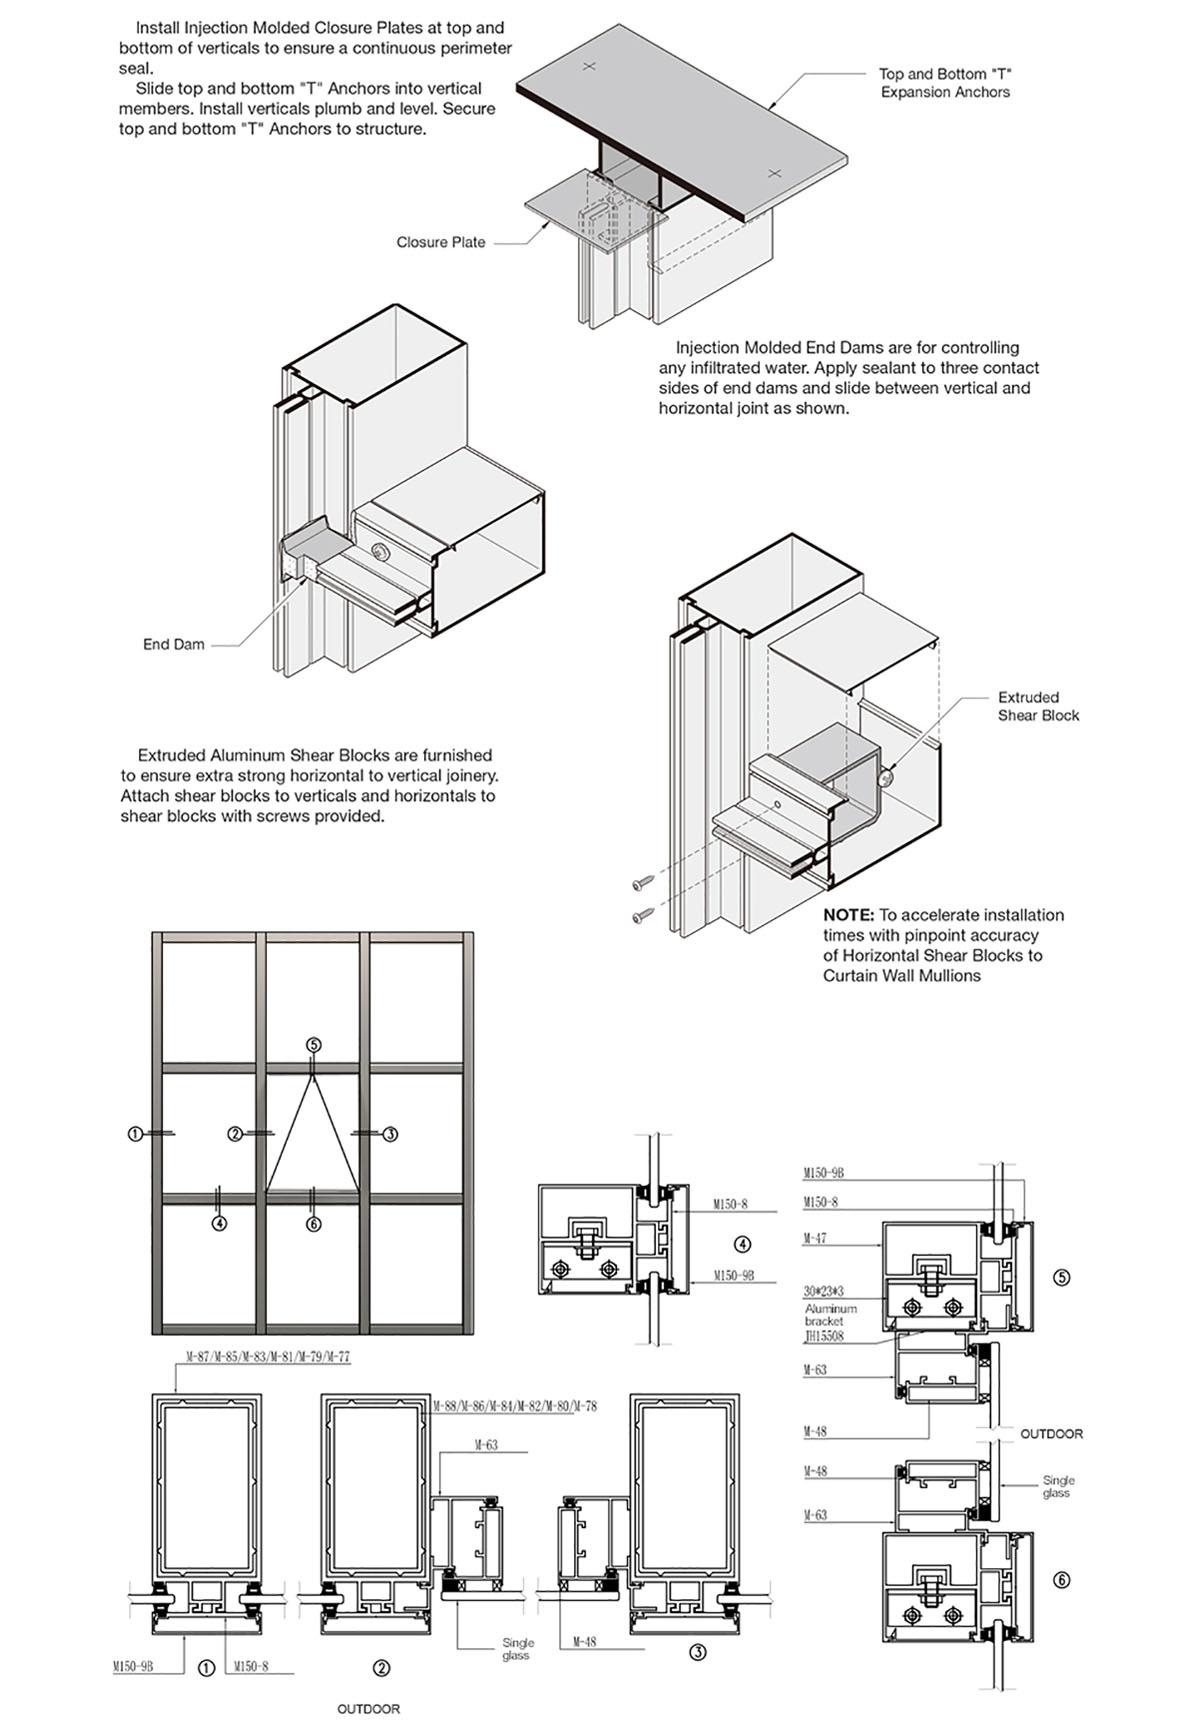 curtain wall environment diagram